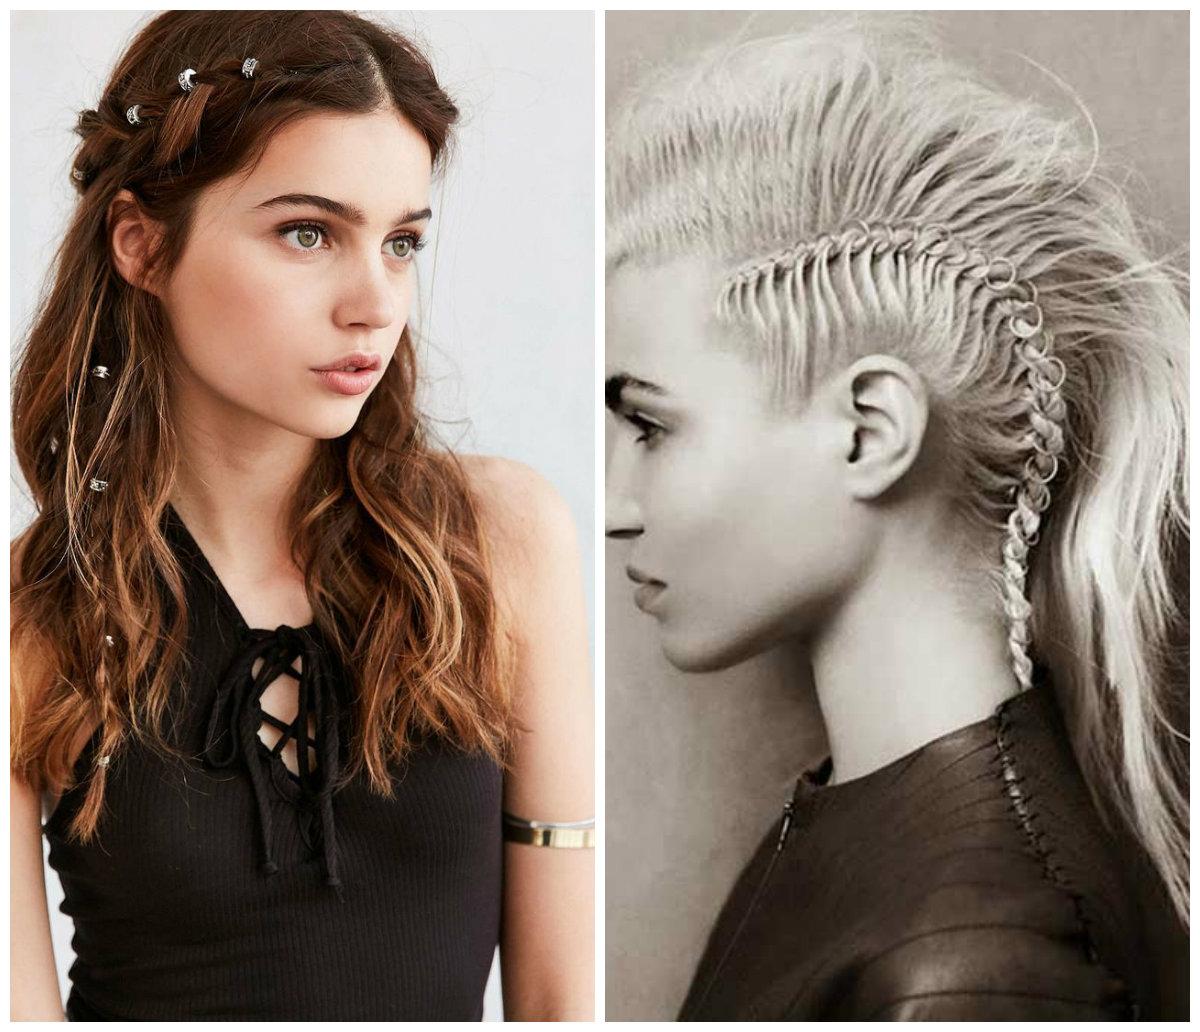 penteados longos, accesoris rock